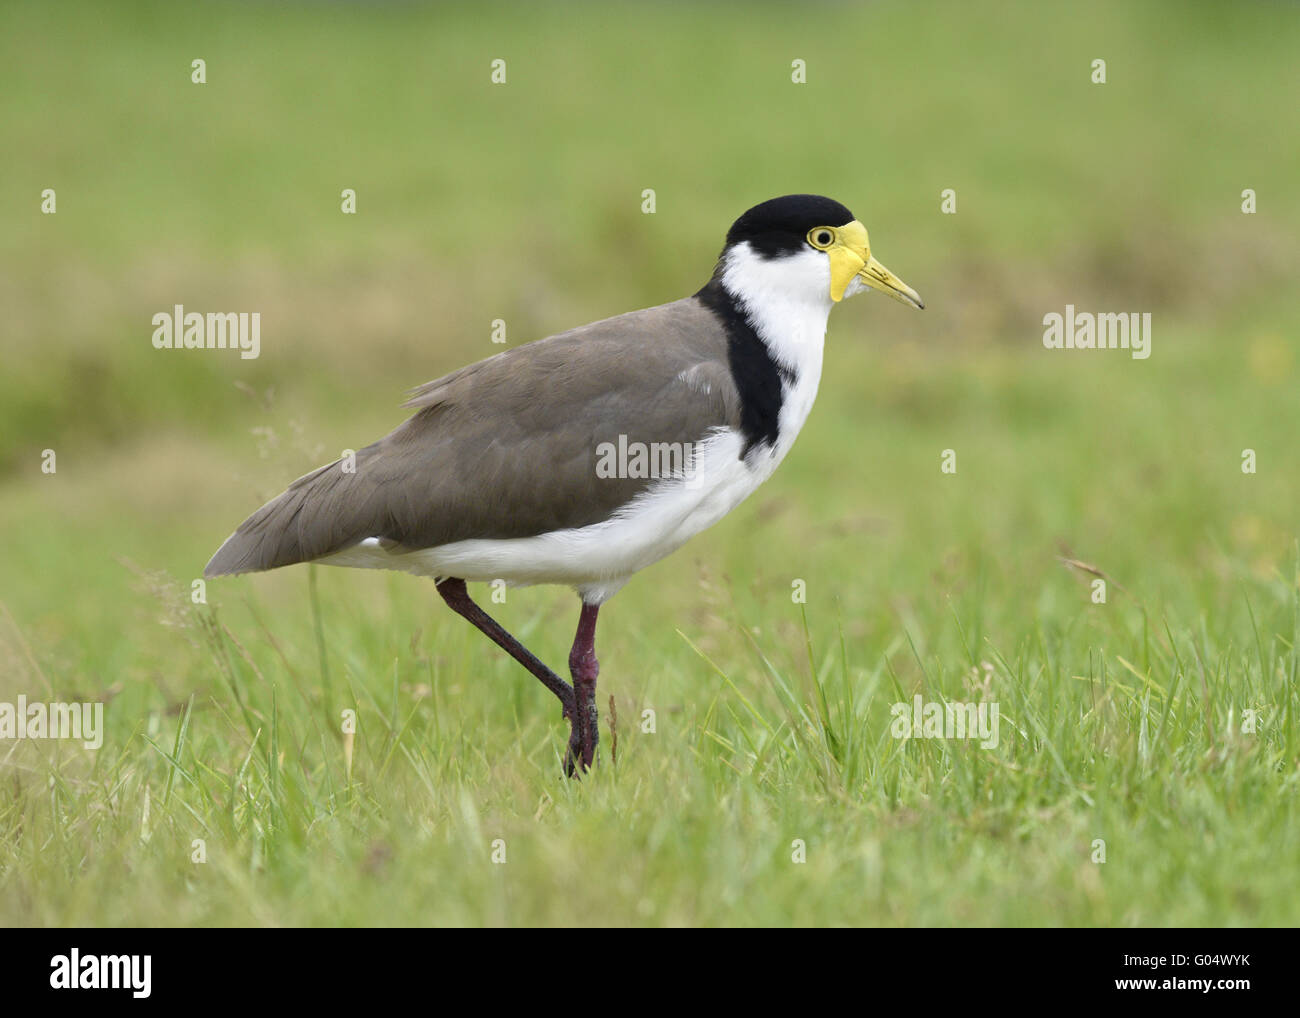 Masked Lapwing - Vanellus miles - Stock Image